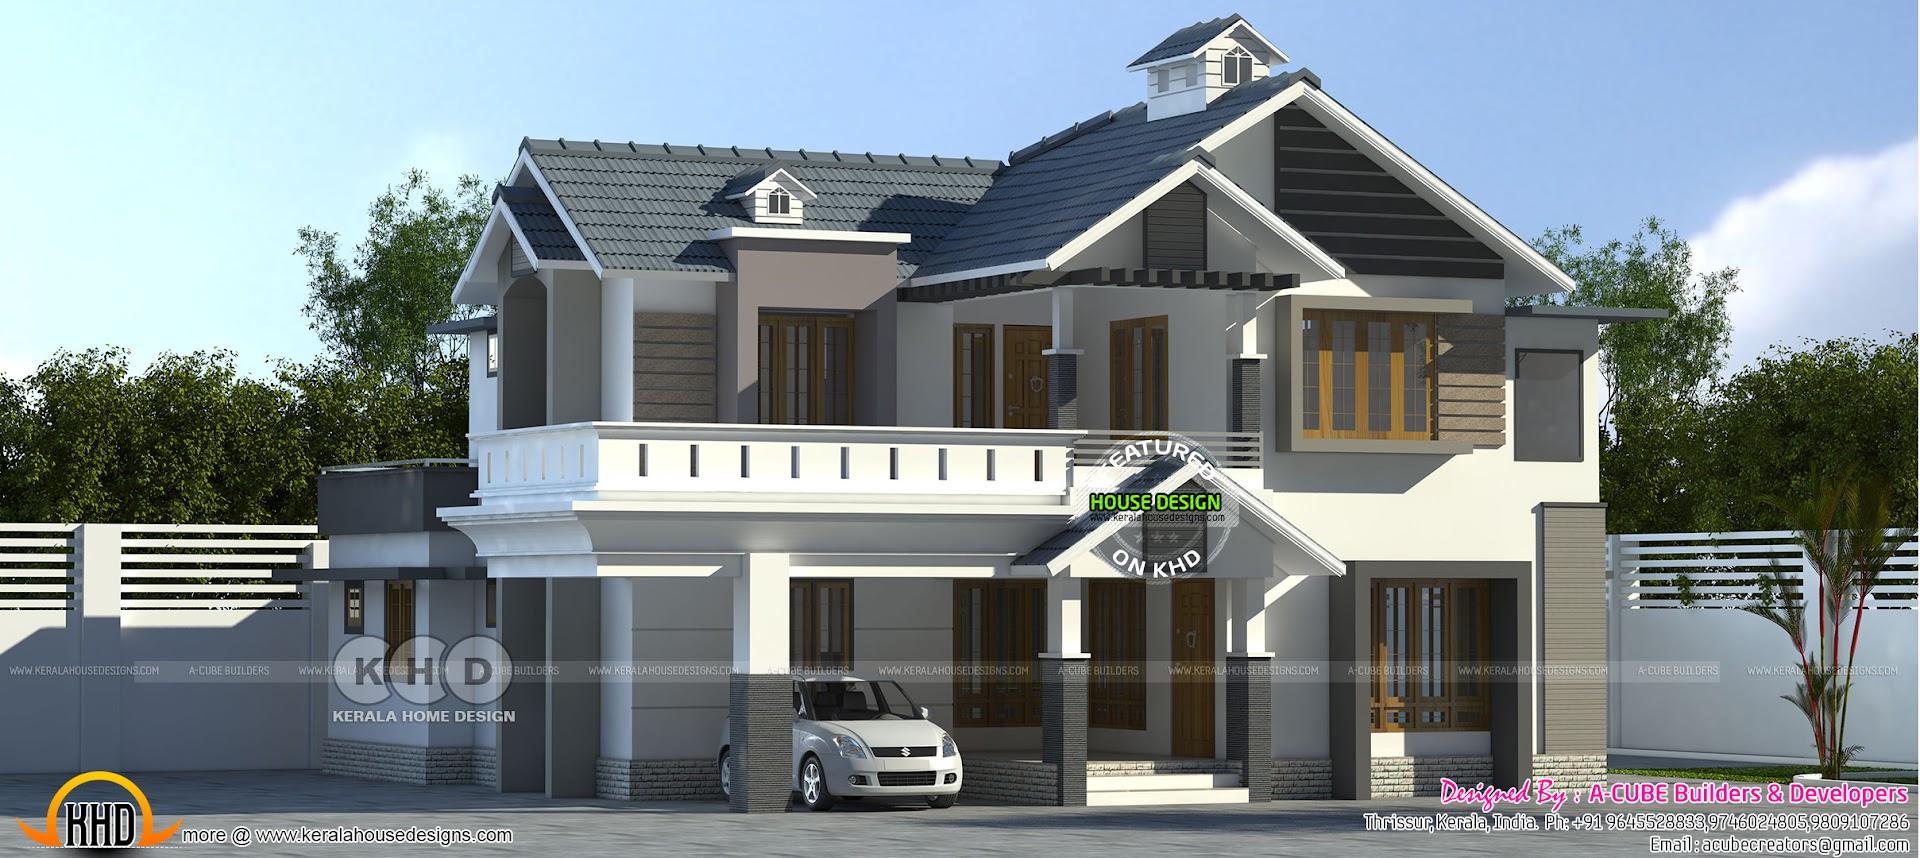 2361 Sq Ft Modern House 4 Bedroom Kerala Home Design Bloglovin